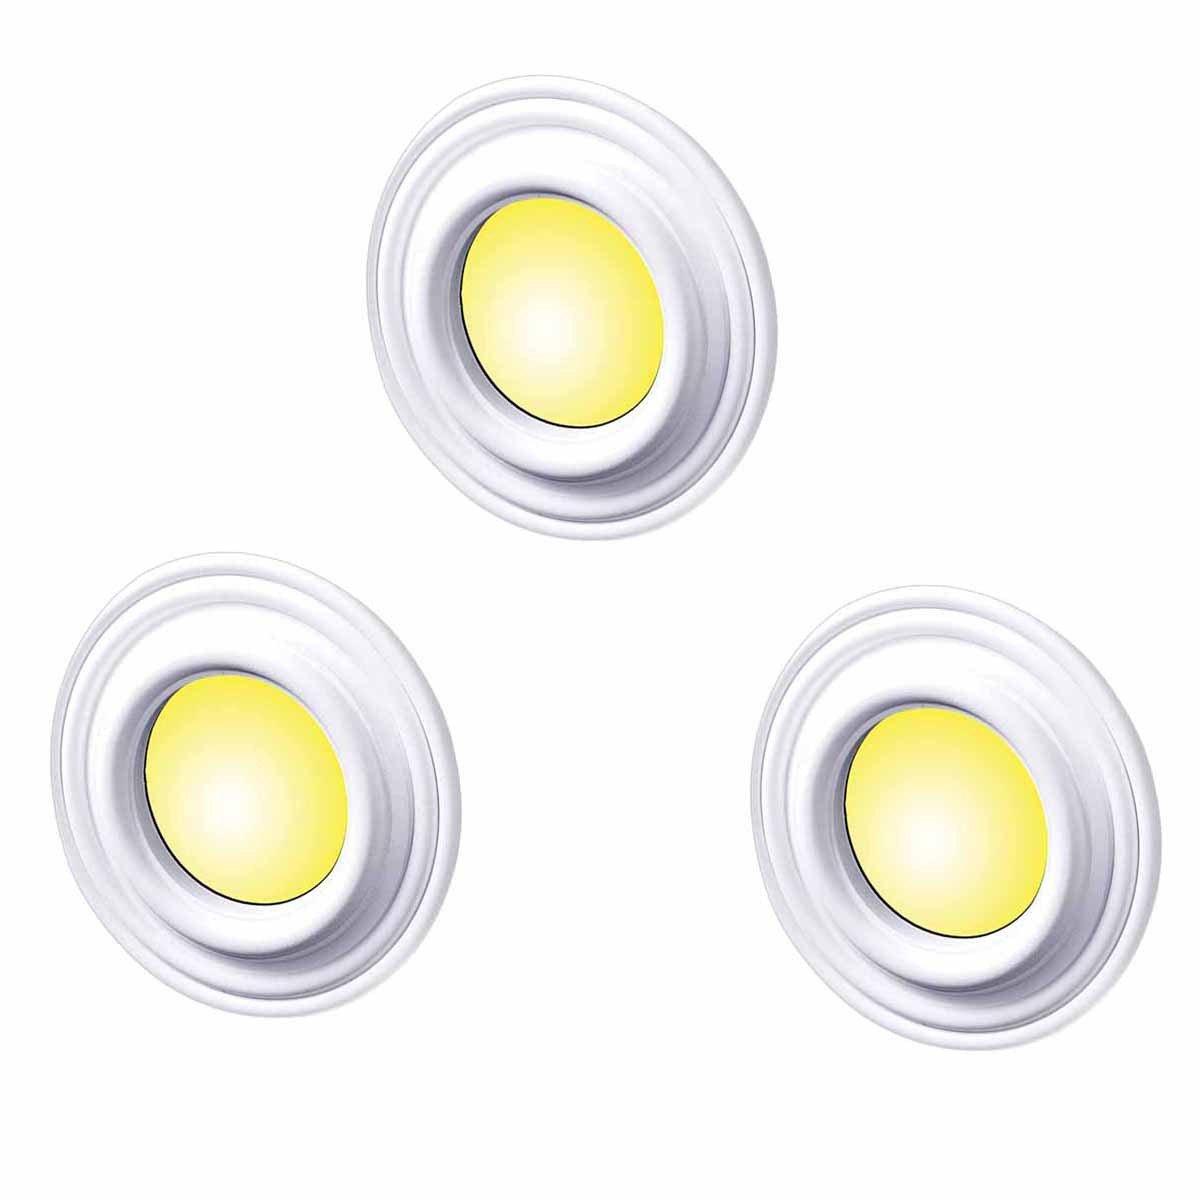 3 Spot Light Trim Medallions White Urethane 4'' ID Set Of 3